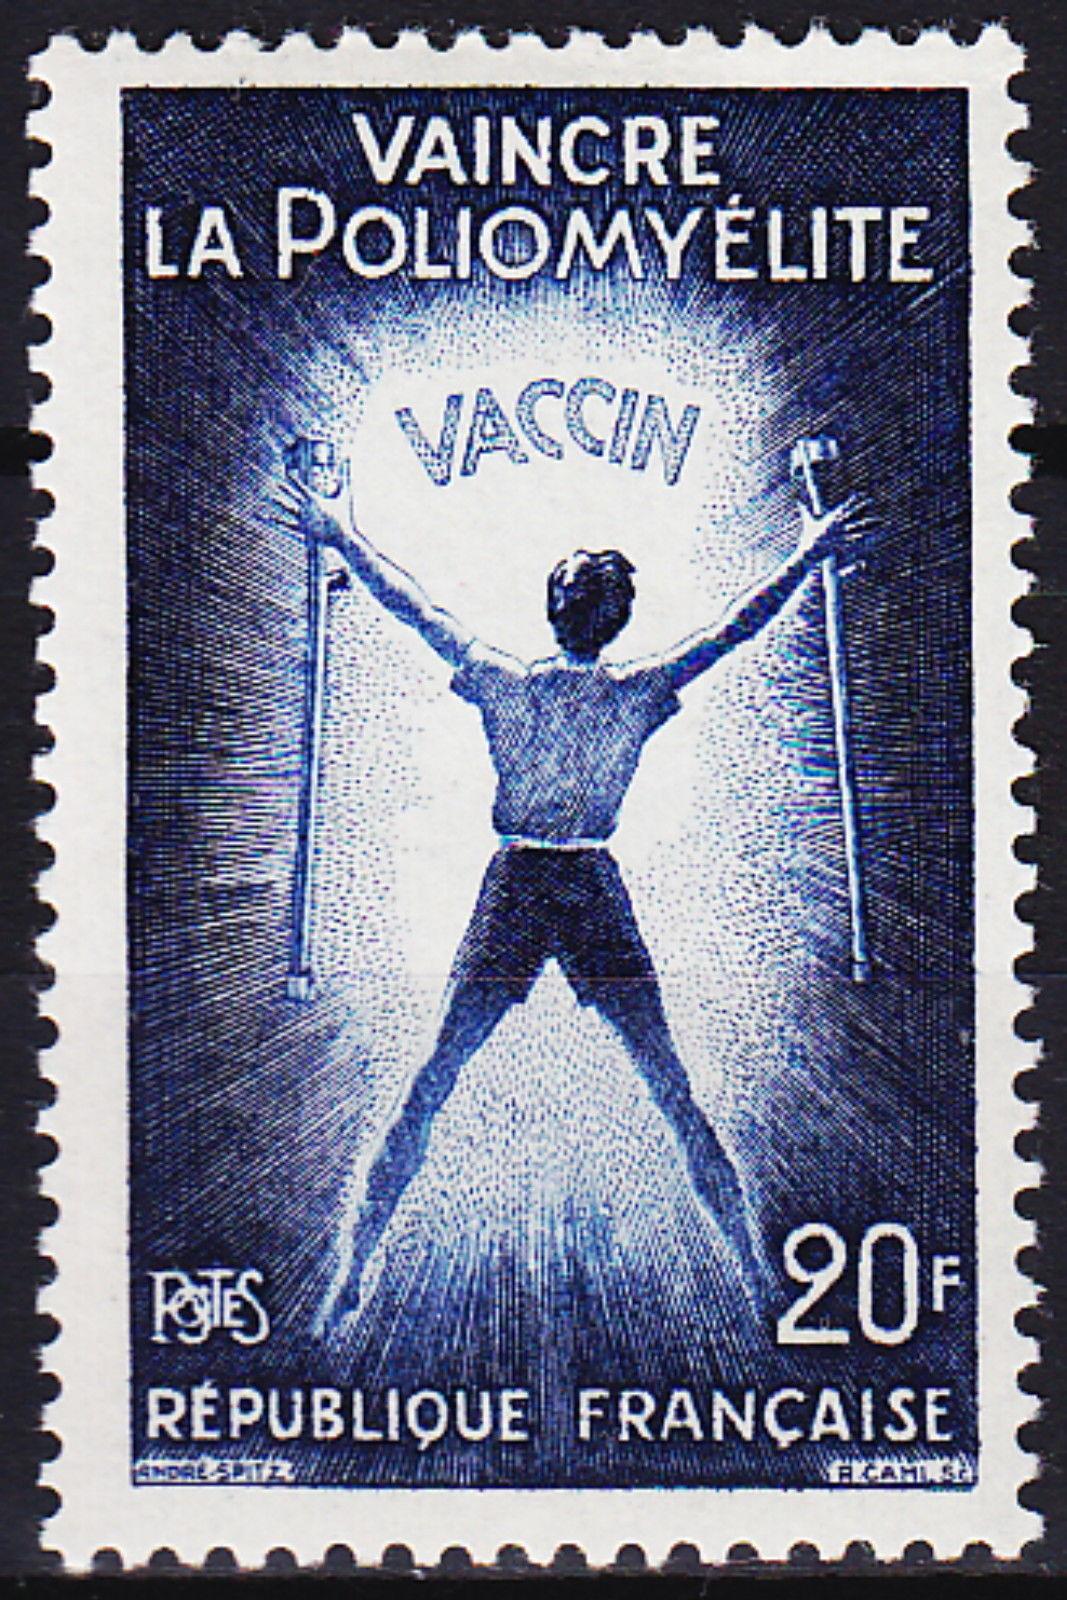 France 1959 Vaccination Against Poliomyelitis